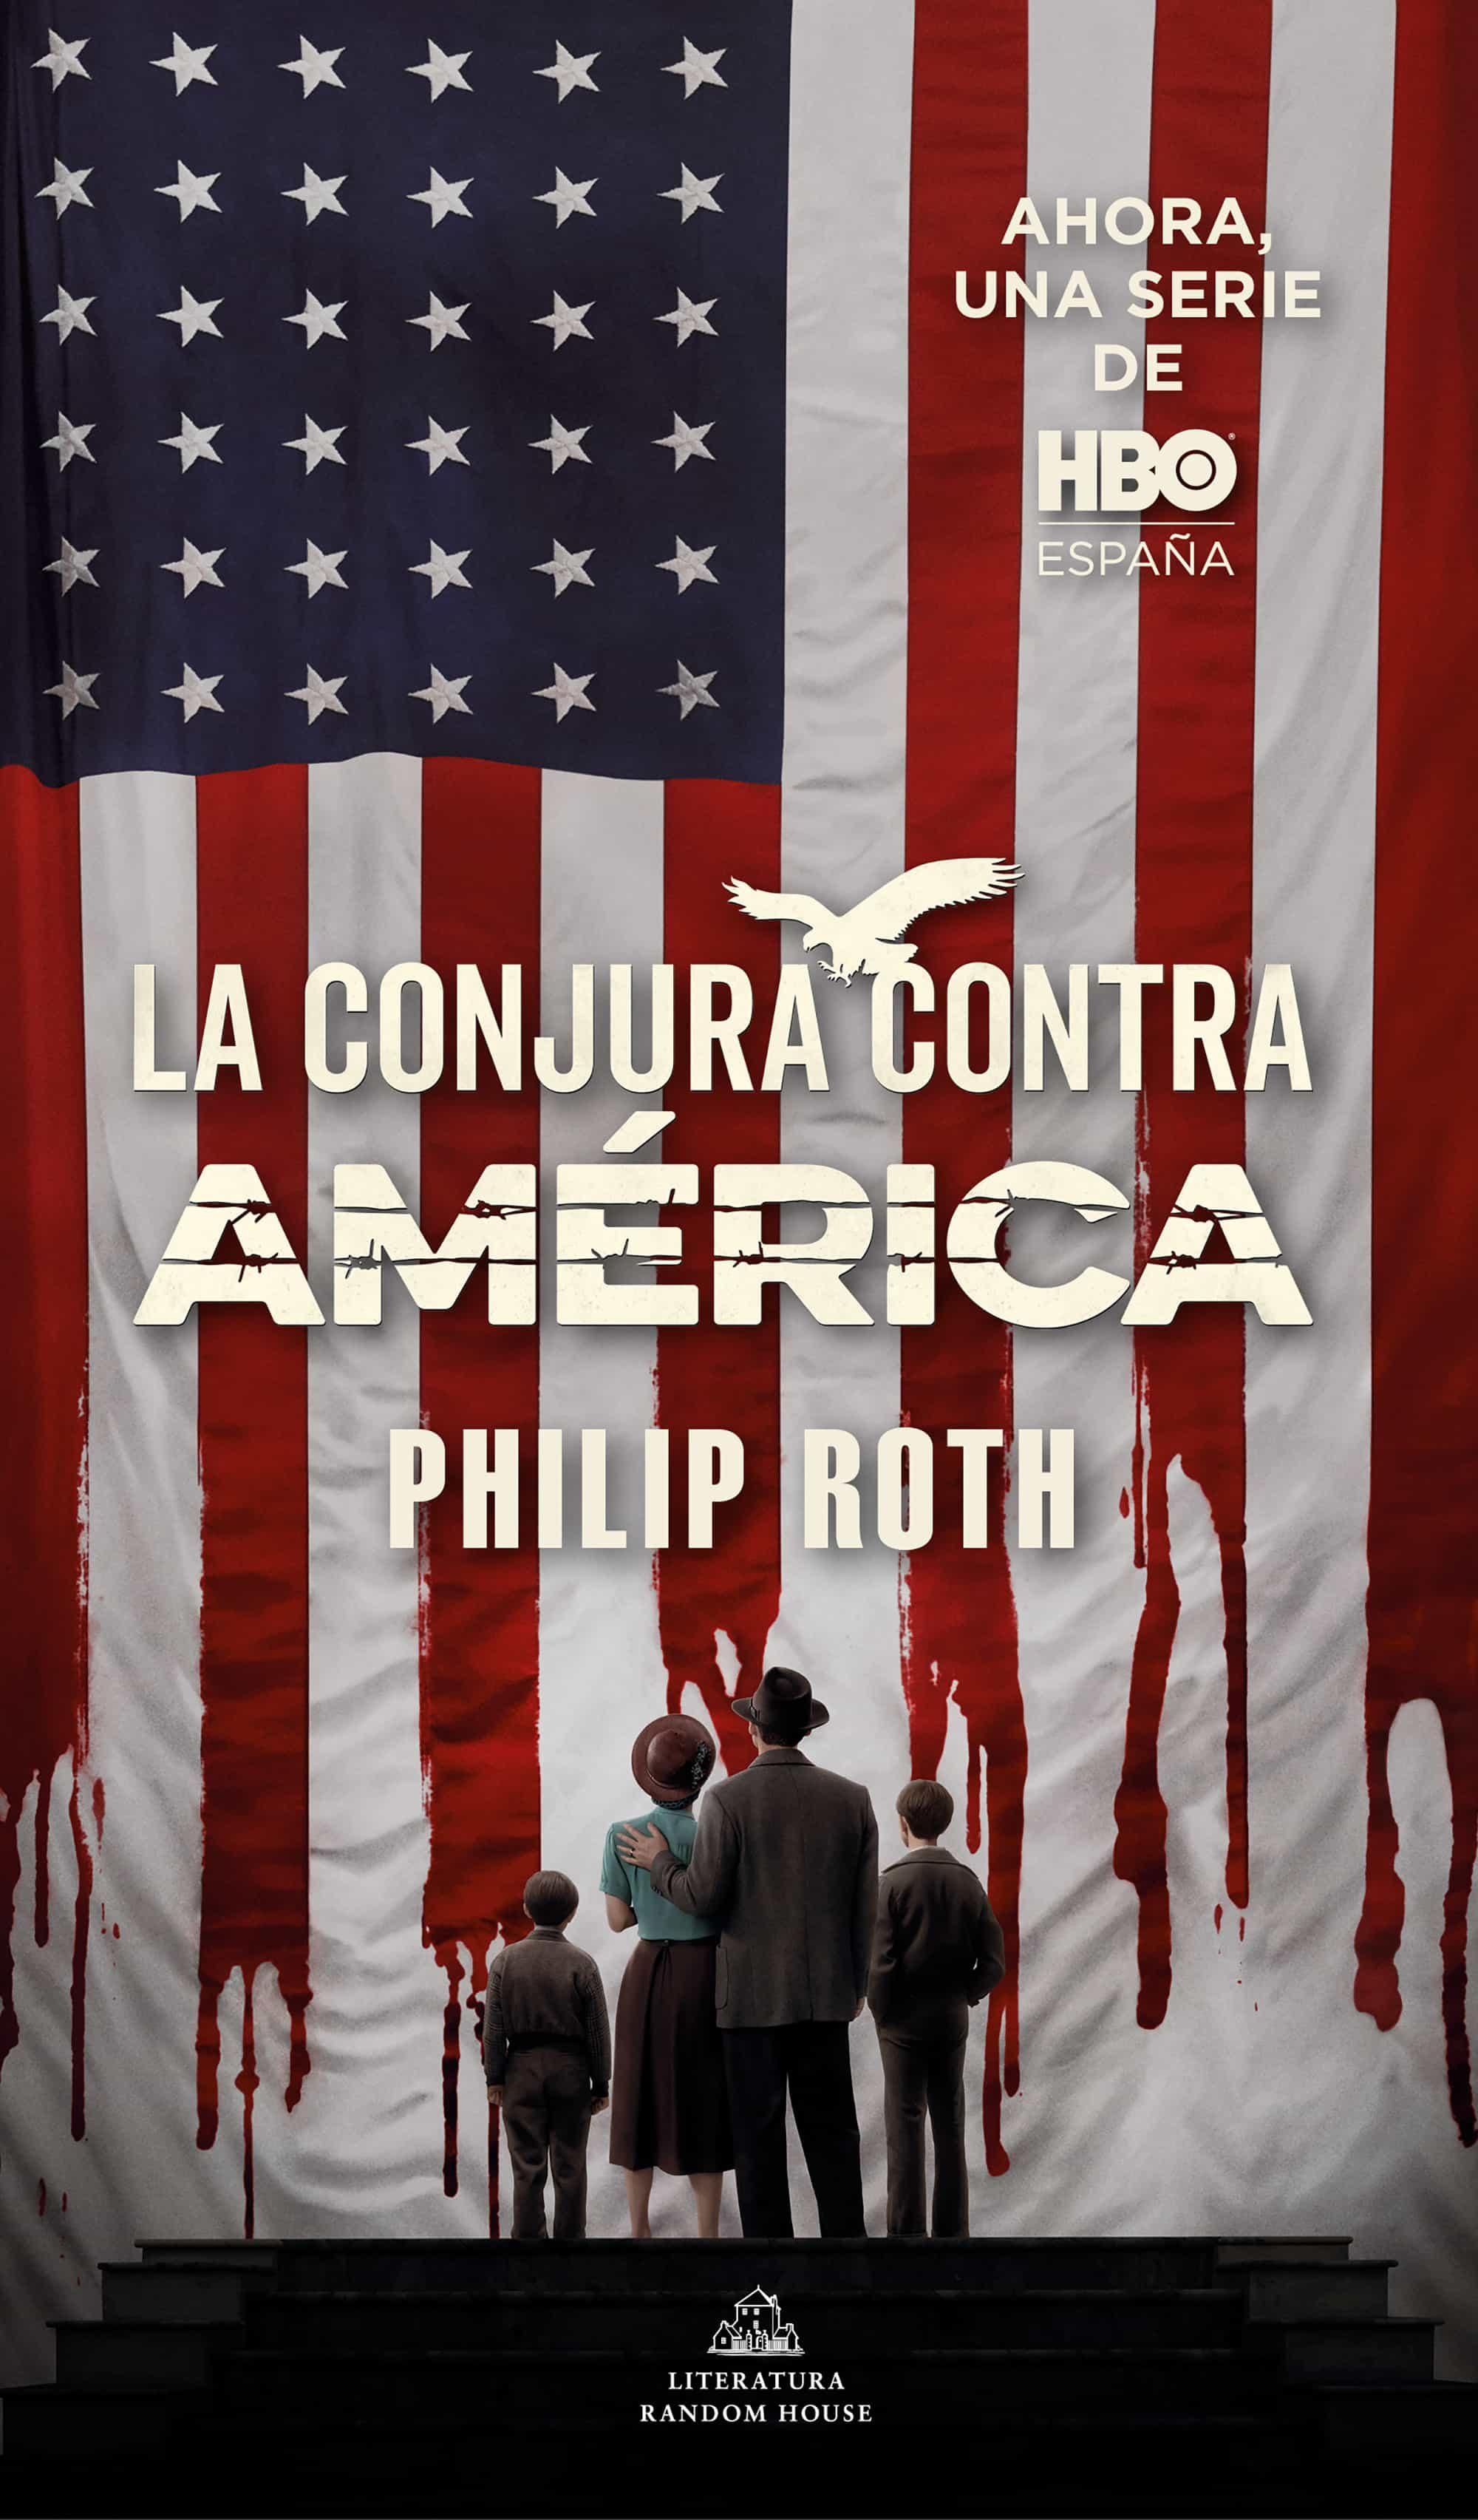 La Conjura Contra Am�rica (ebook)philip Roth9788439701699